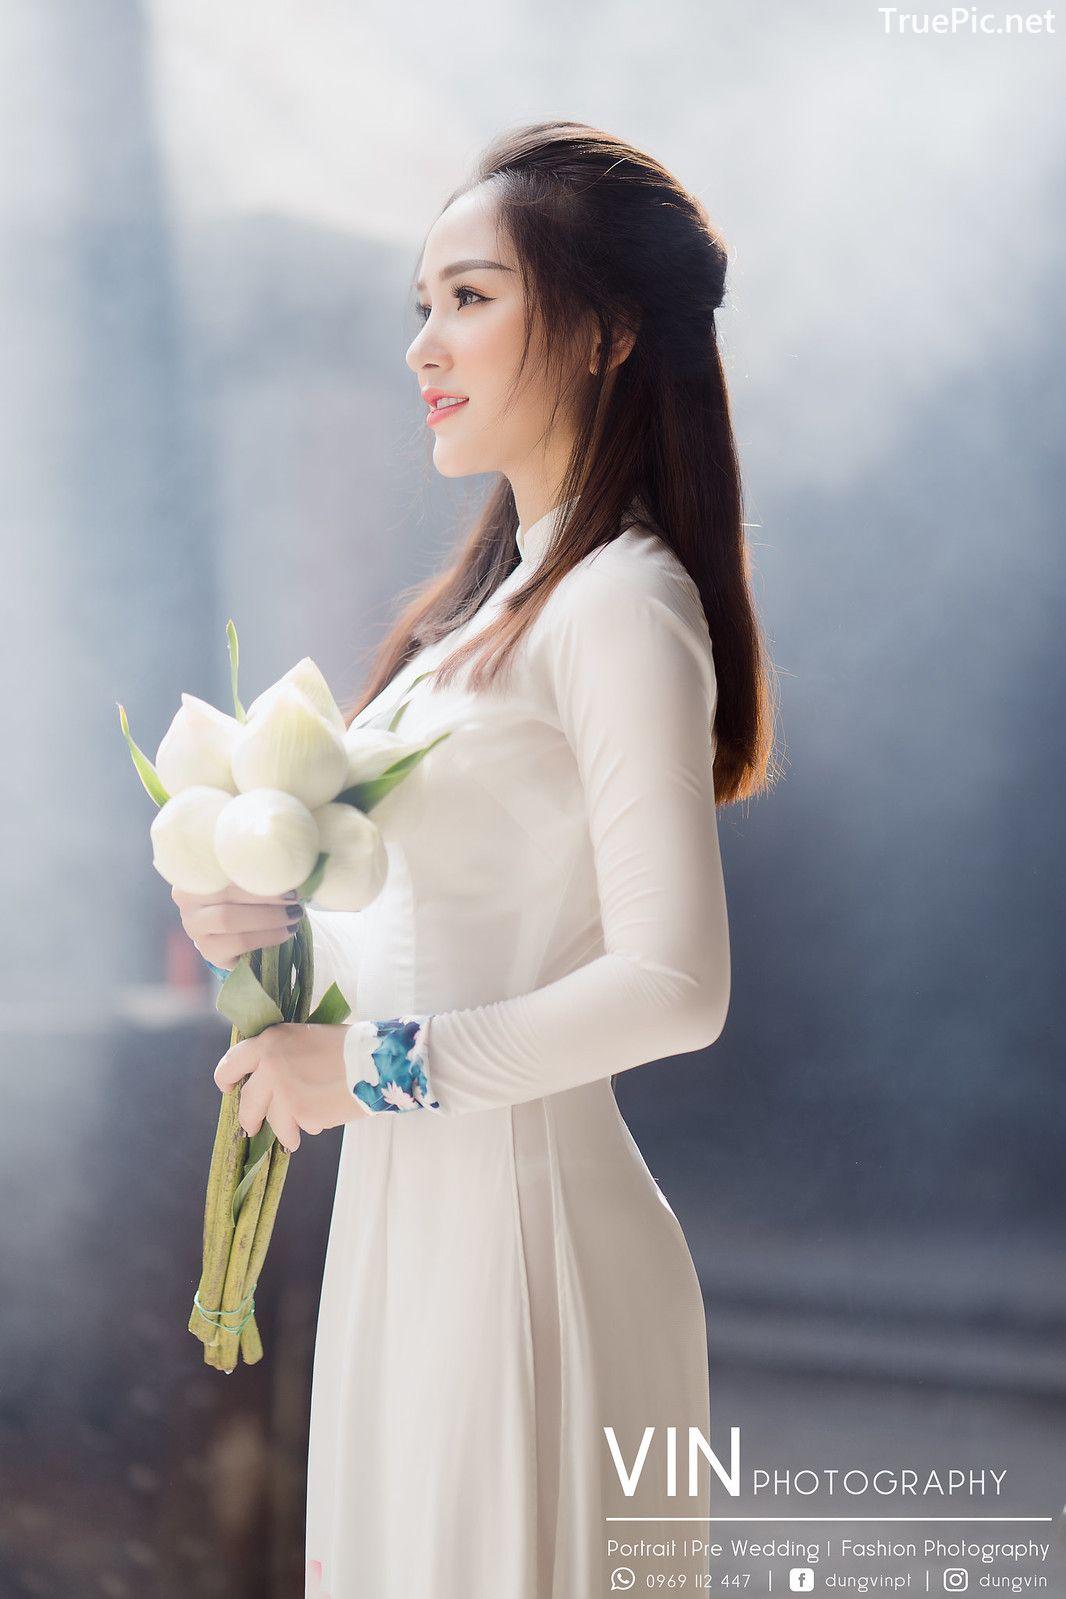 Image-Vietnamese-Beautiful-Girl-Ao-Dai-Vietnam-Traditional-Dress-by-VIN-Photo-1-TruePic.net- Picture-3